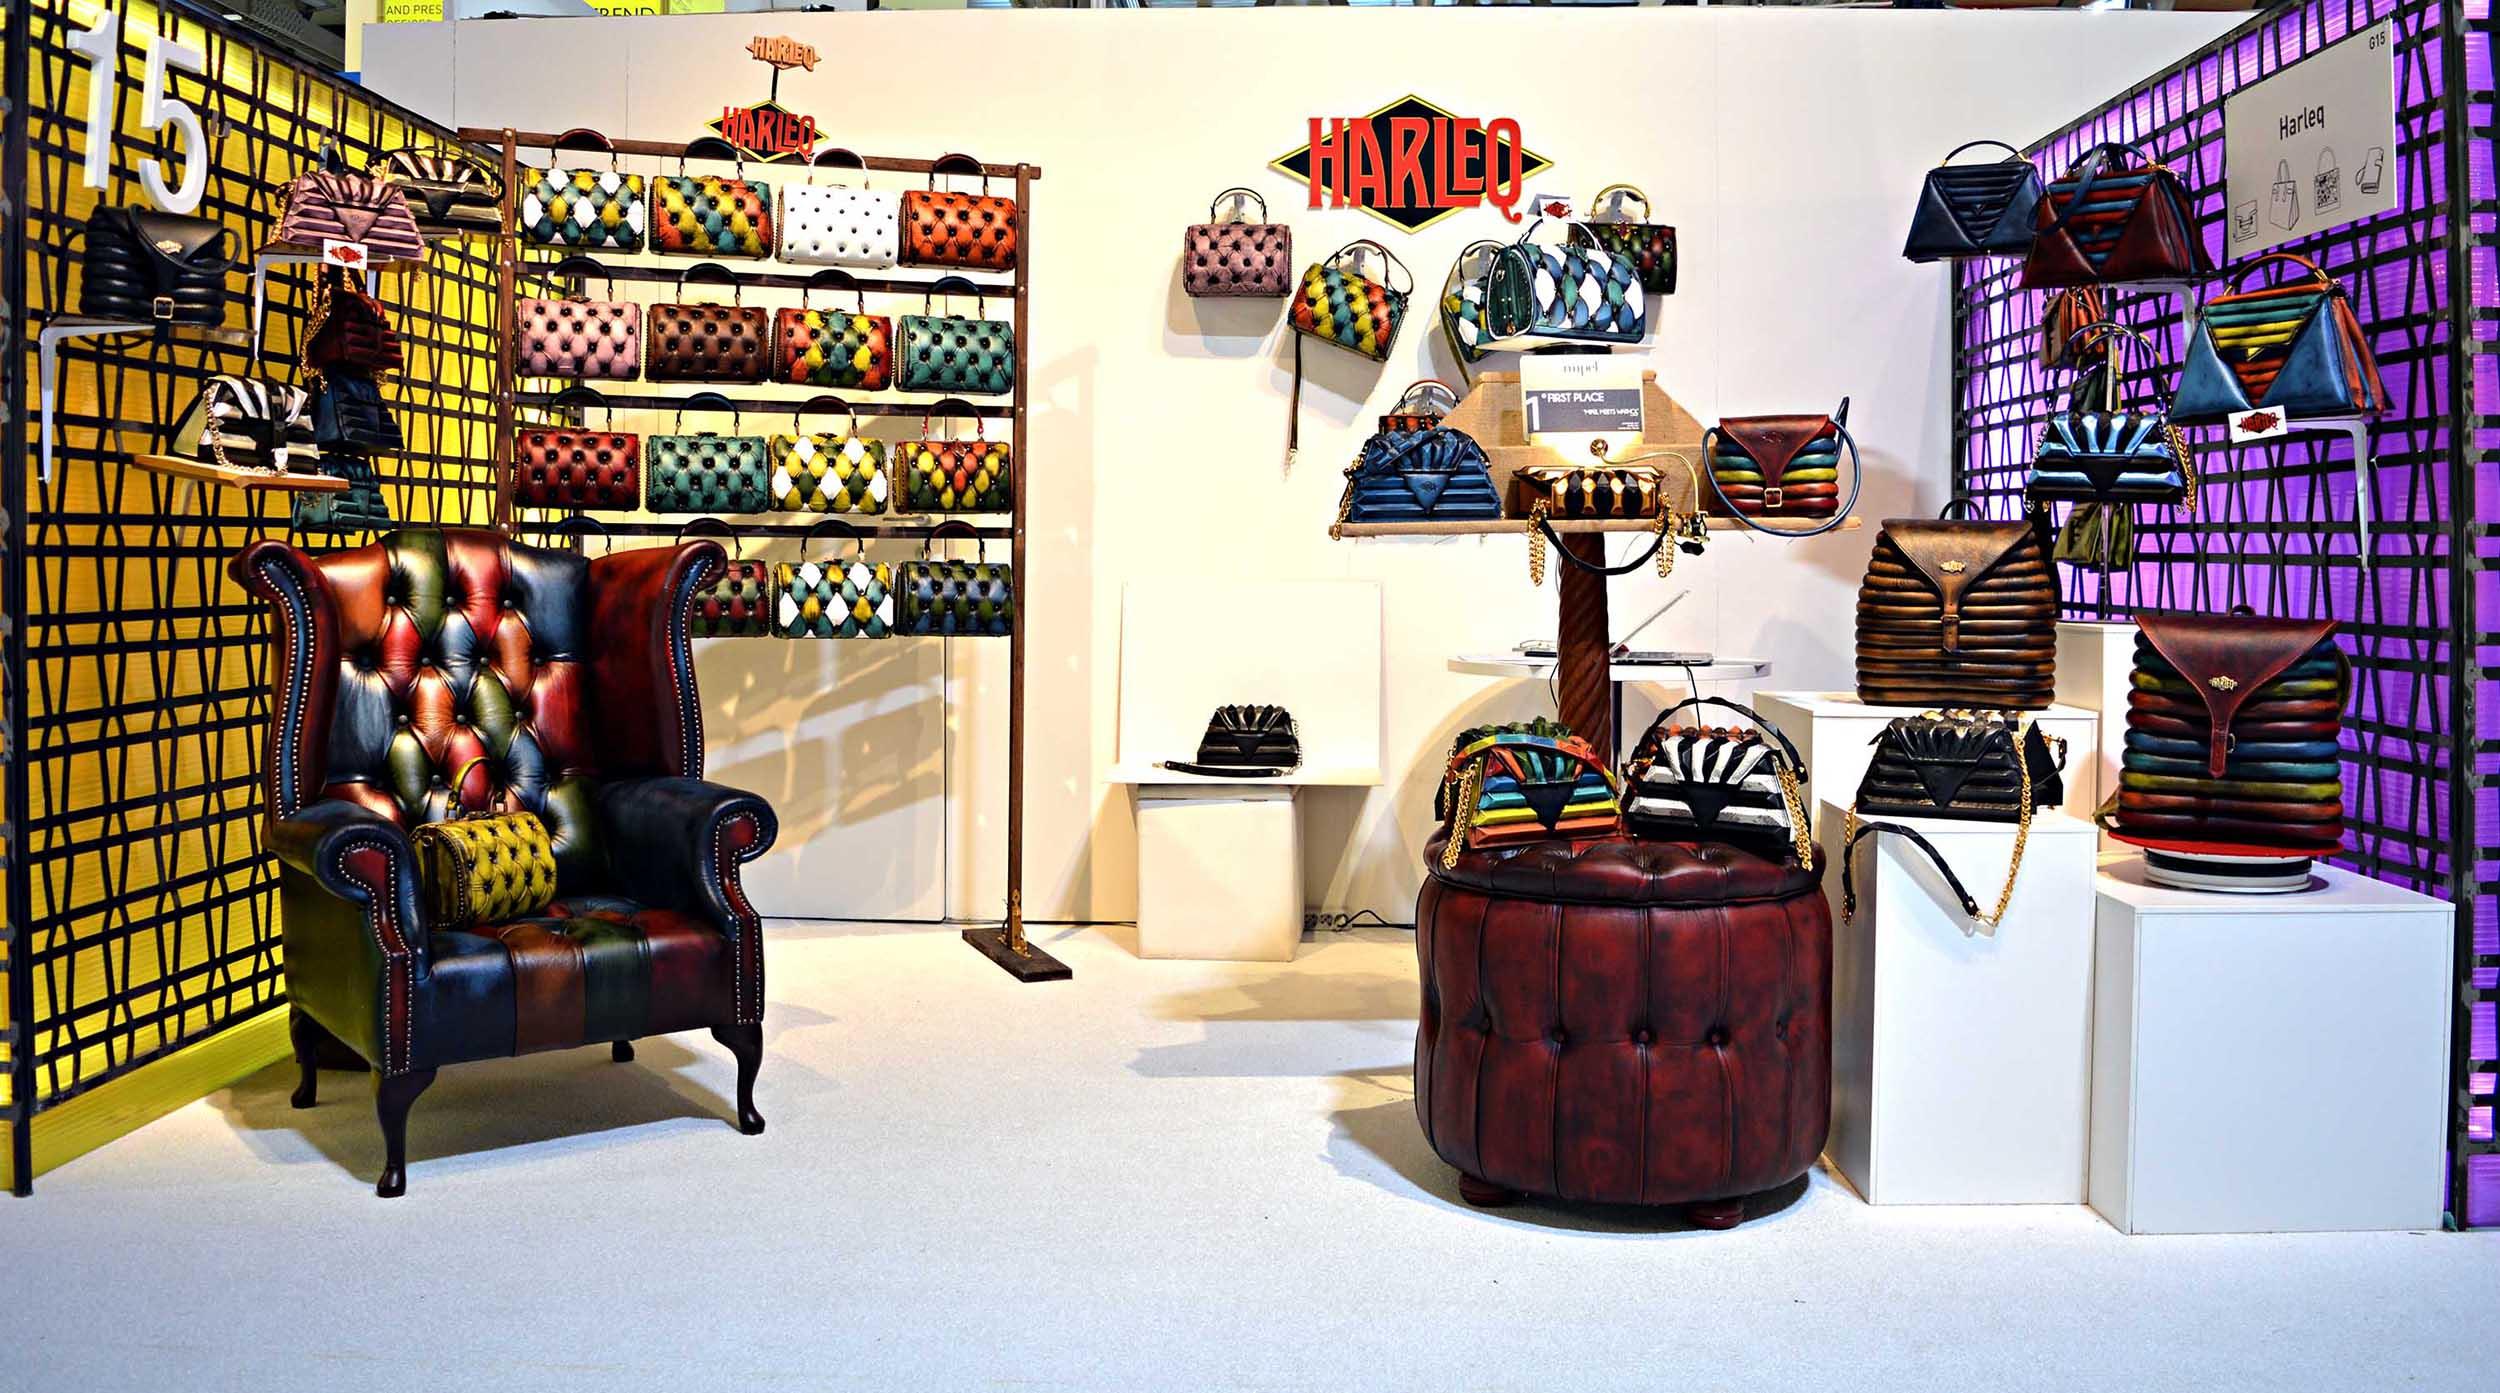 harleq luxury bags mipel tradeshow